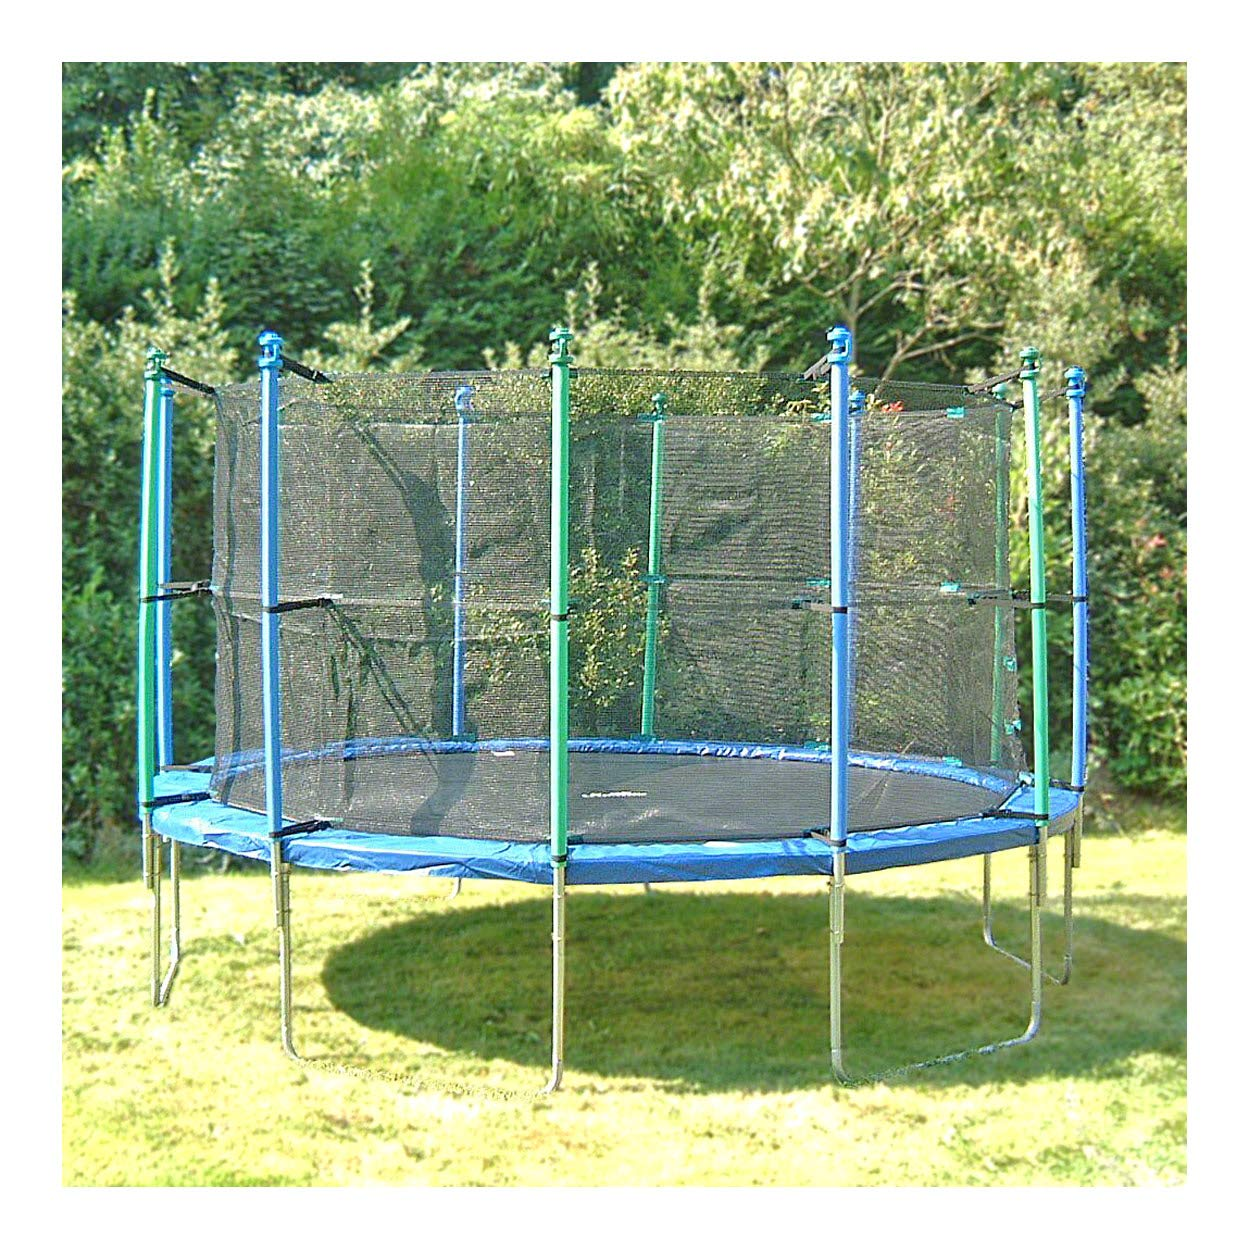 Trimilin Trampolin Fun 43 Outdoor Trampolin Gartentrampolin inkl Sicherheitsnetz